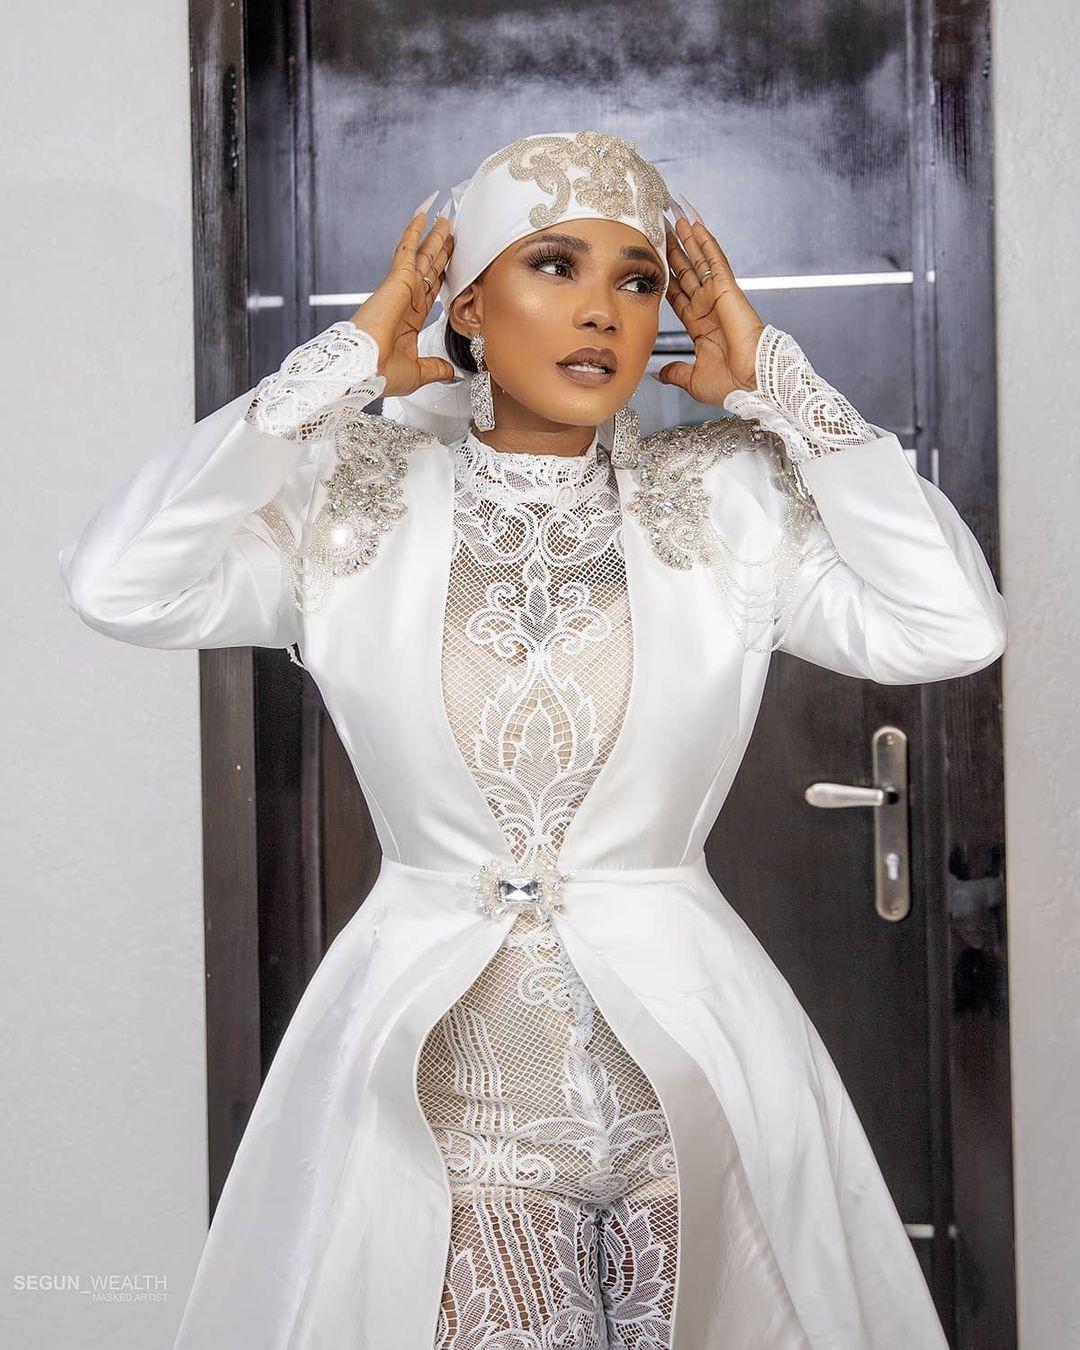 Baba Ijesha's rqpe case: Iyabo Ojo reveals why she's fighting on behalf of Princess